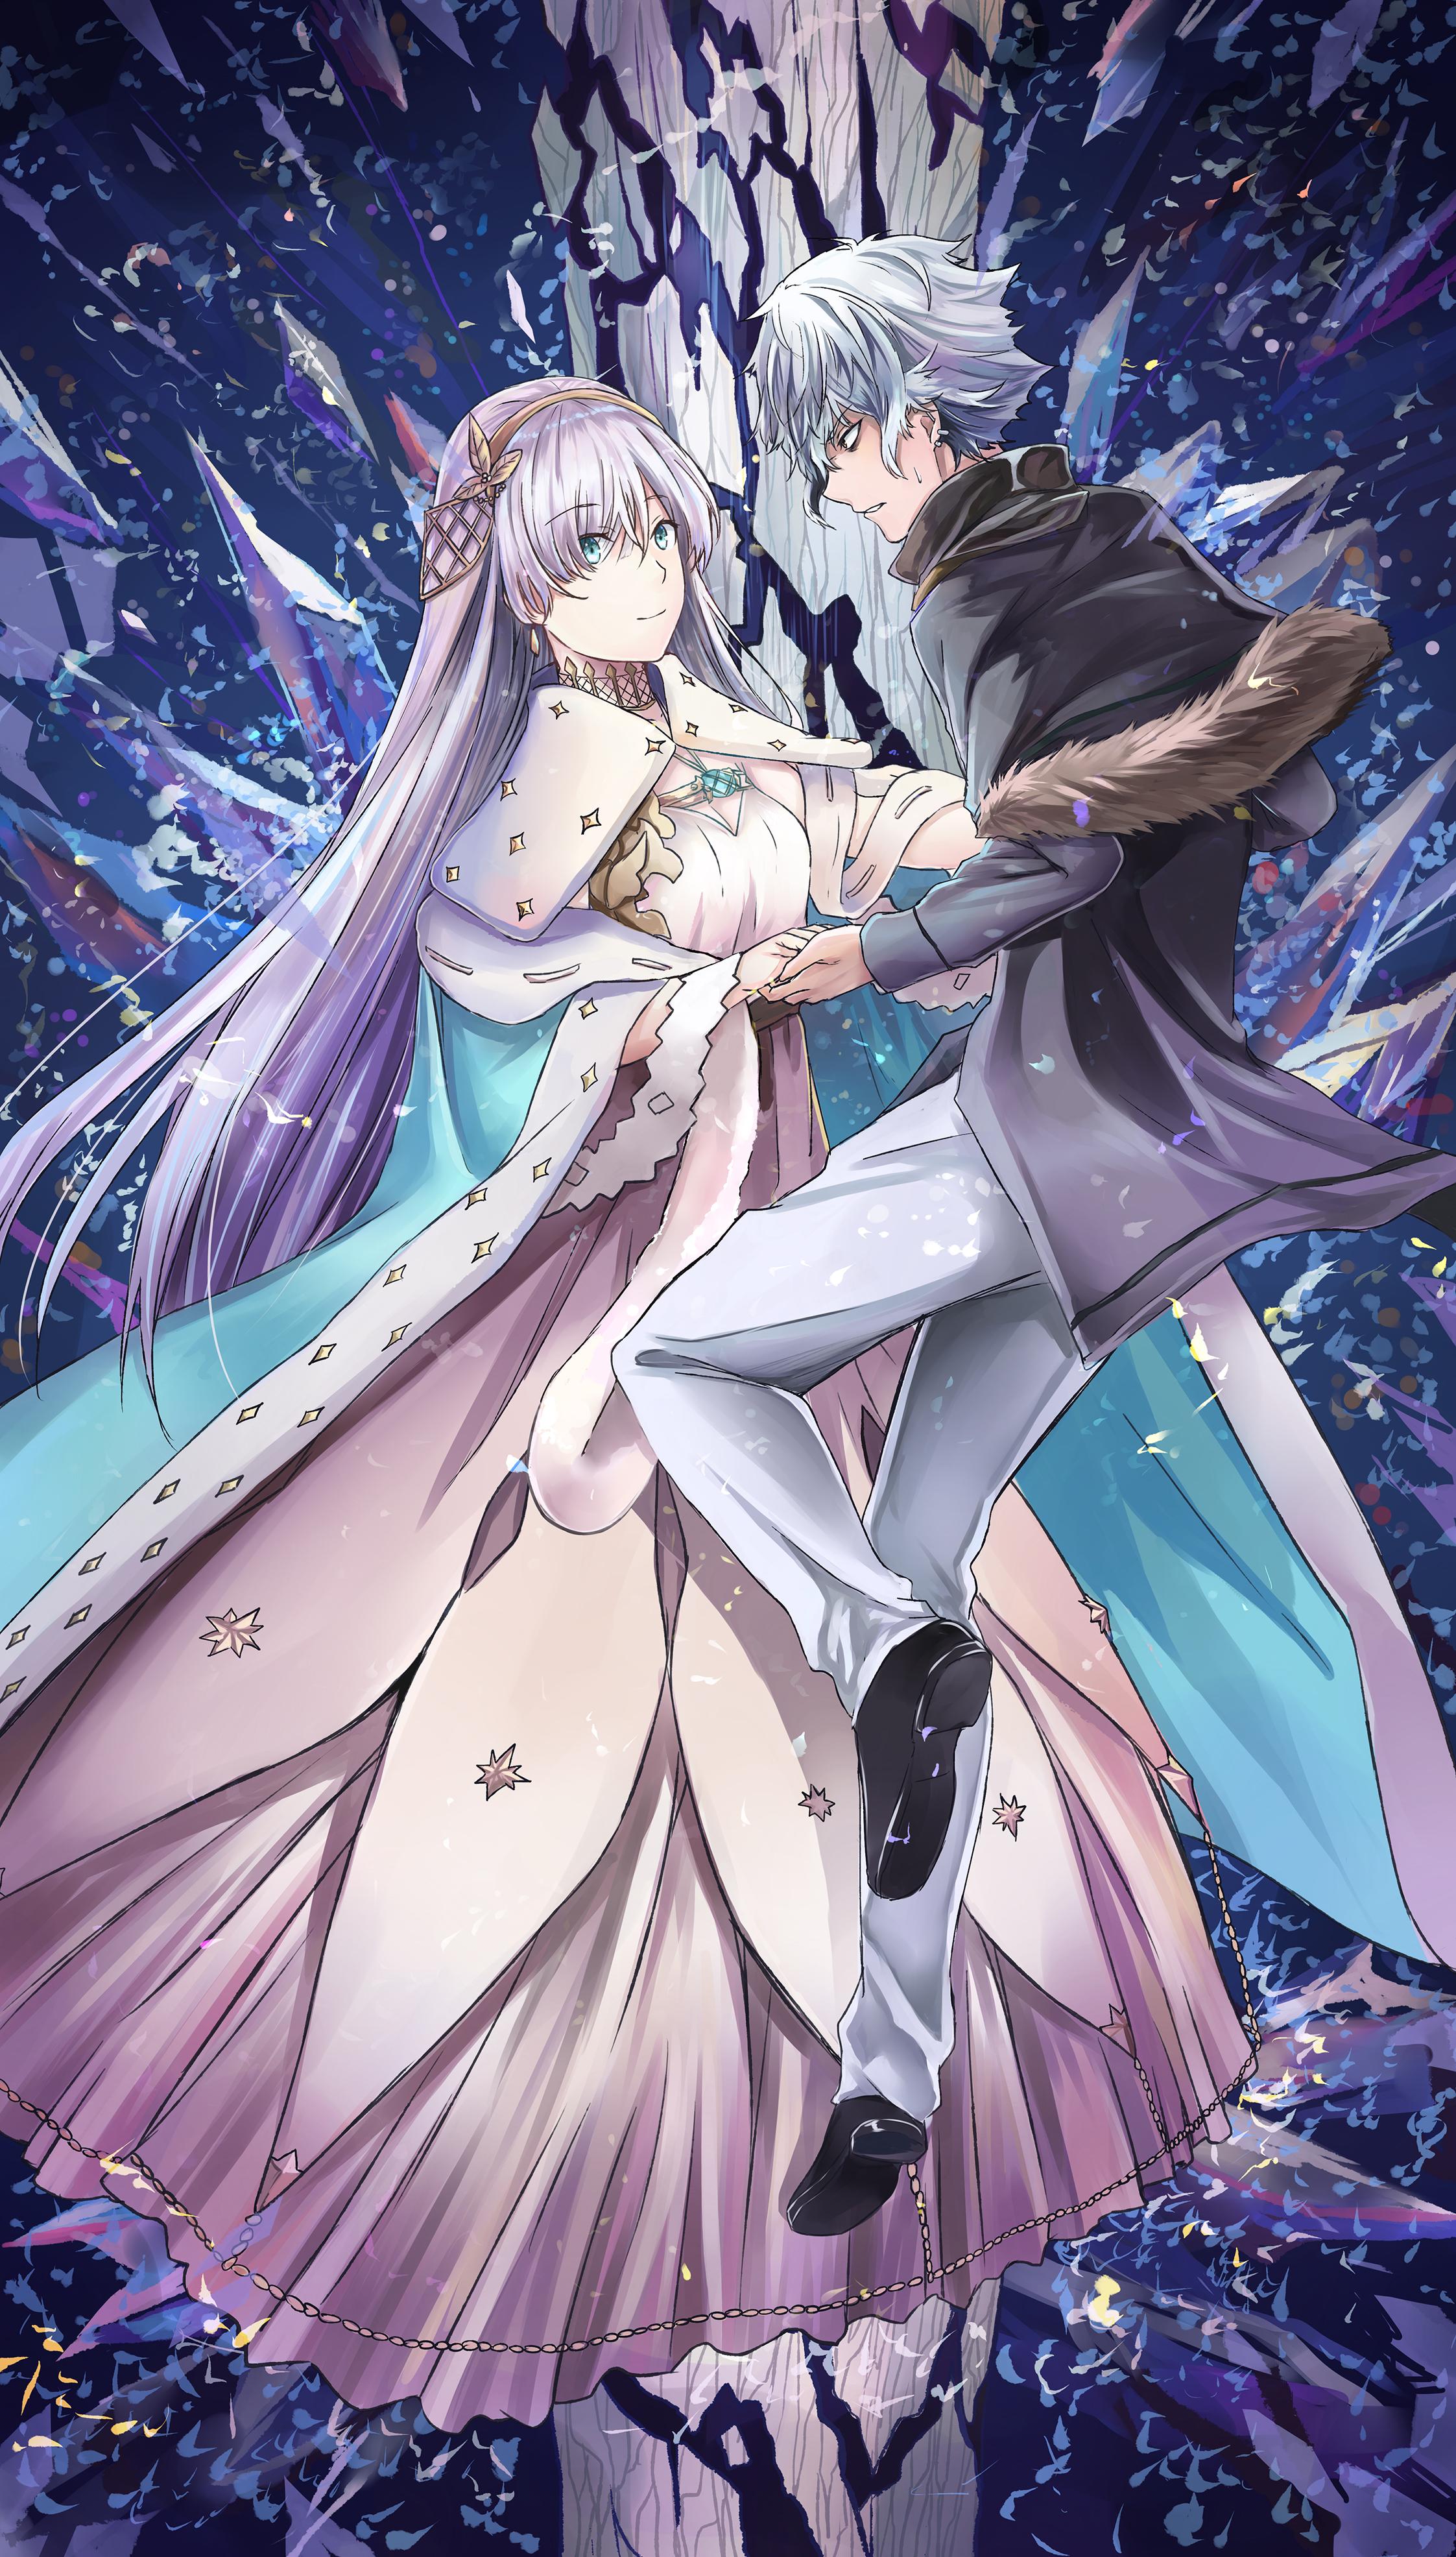 Fate Grand Order Image 2299999 Zerochan Anime Image Board 600 x 900 jpeg 116 кб. fate grand order image 2299999